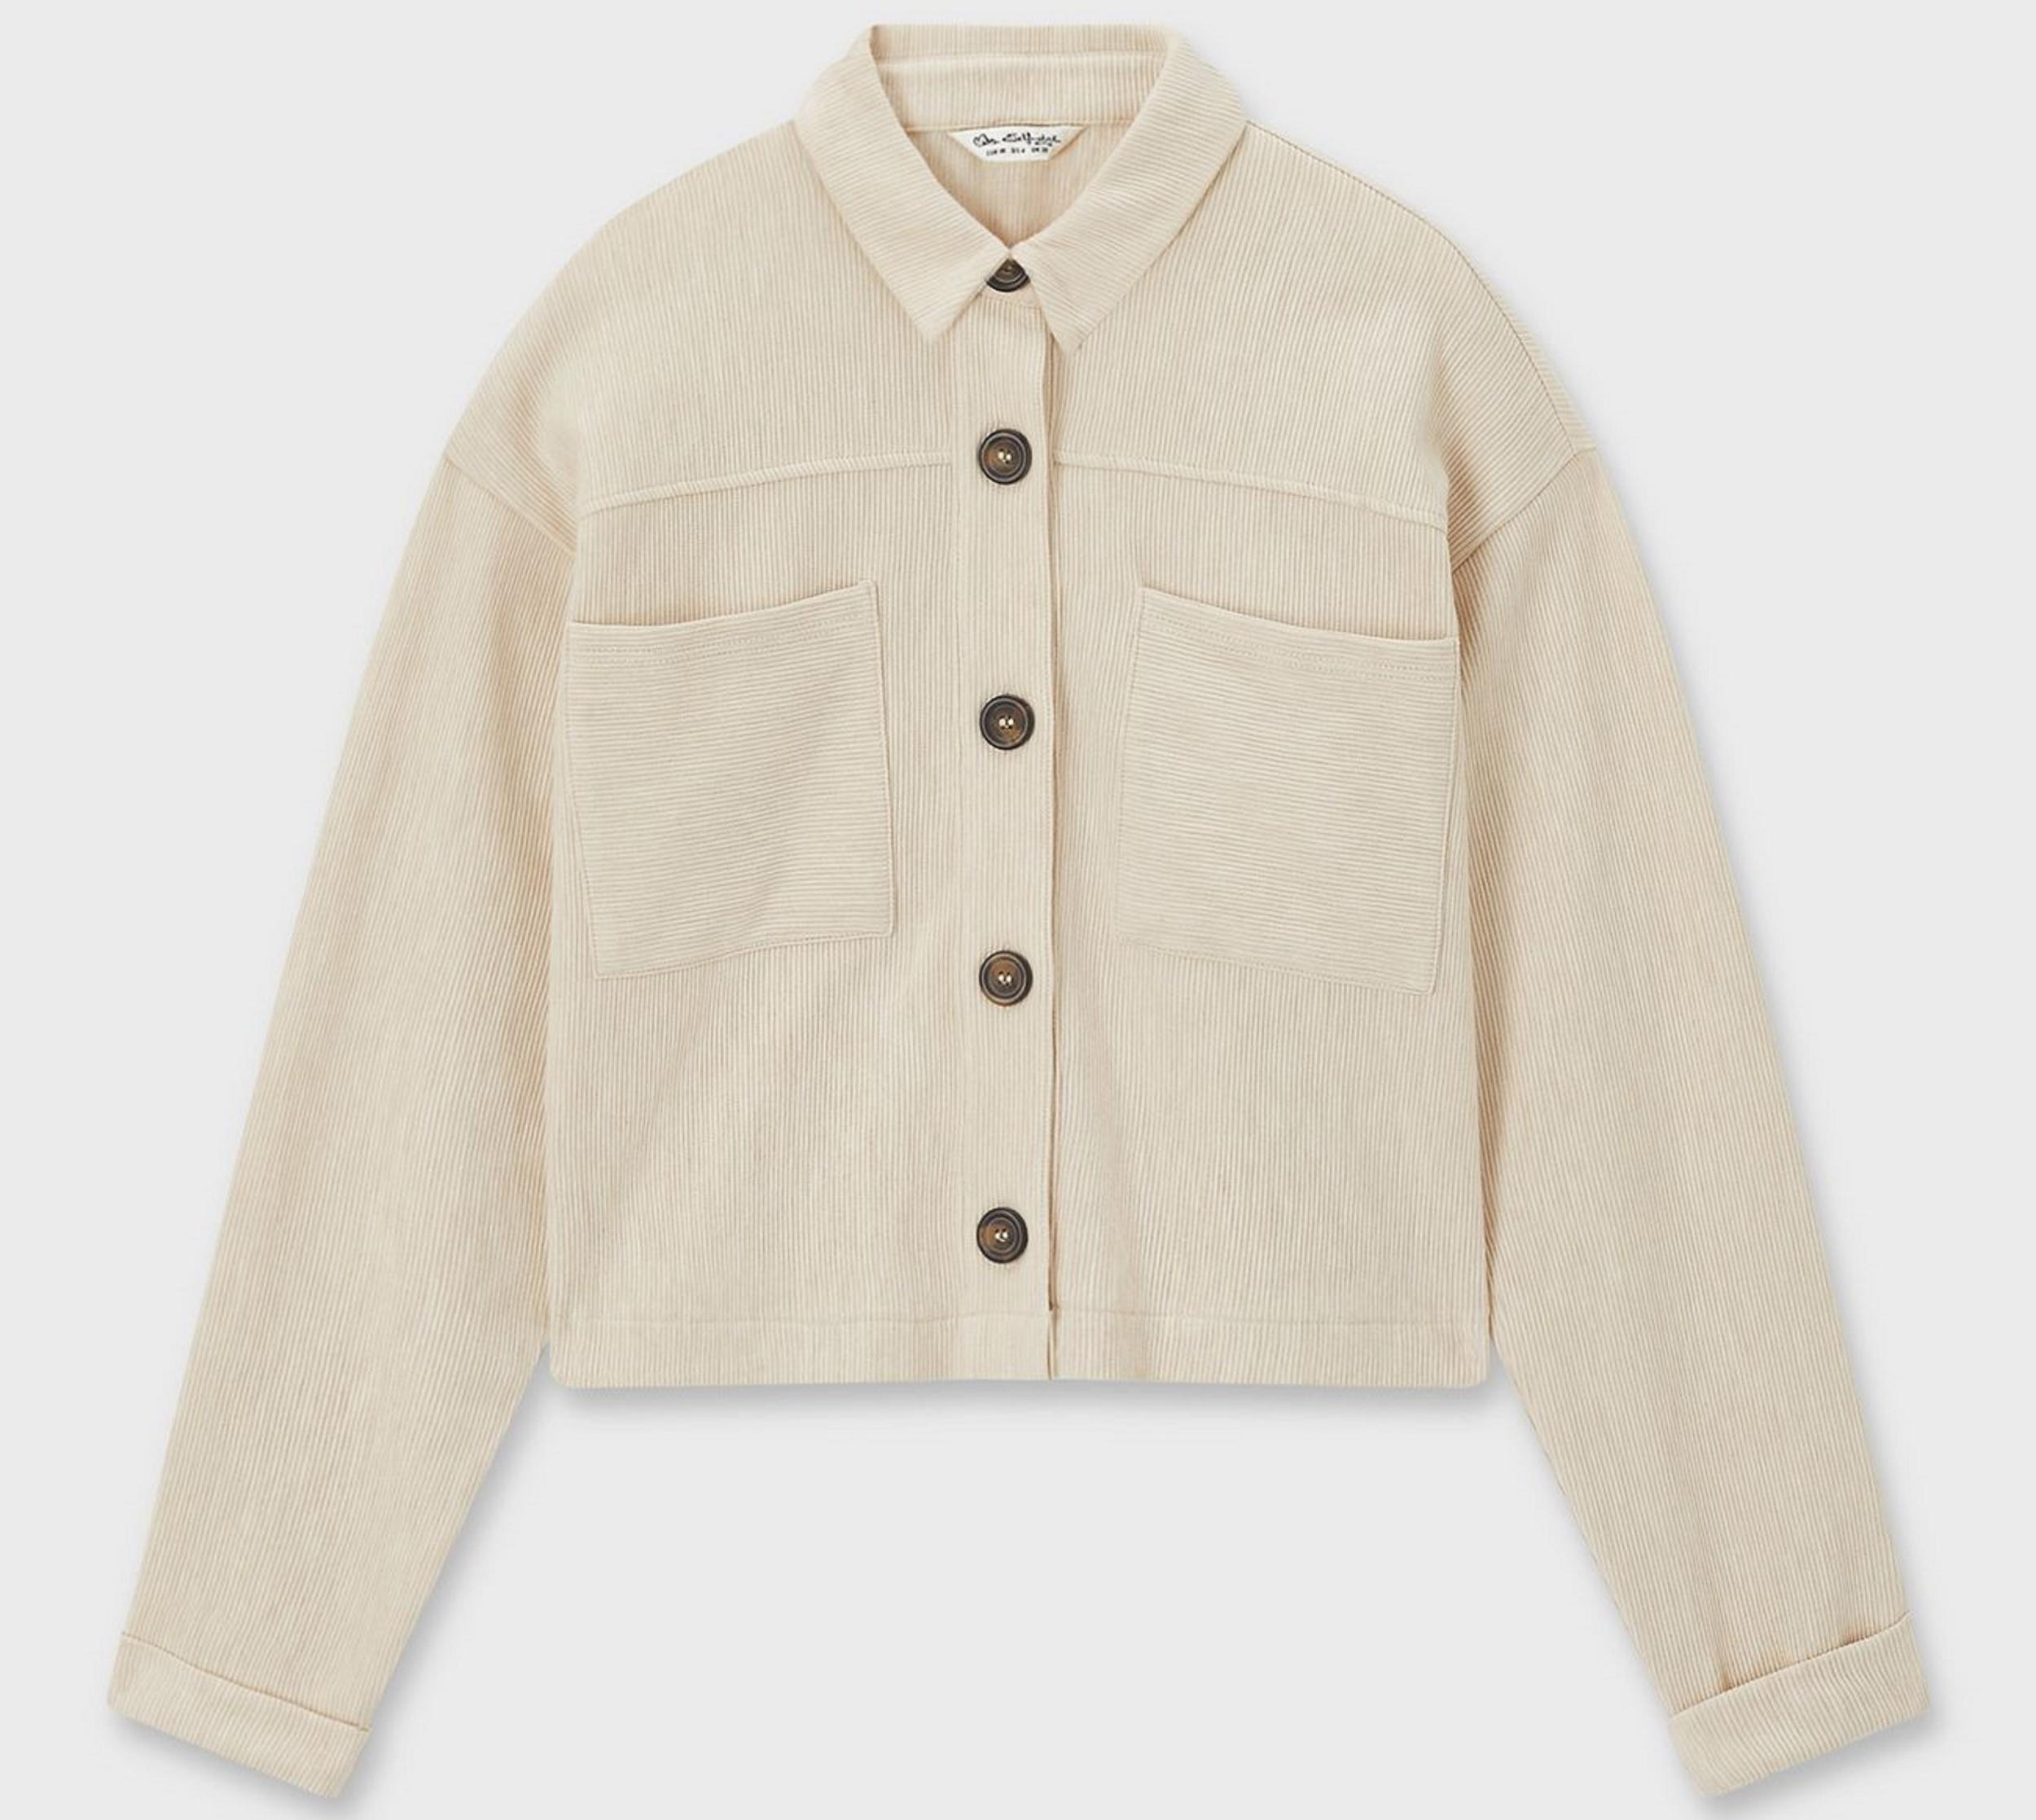 Miss Selfridge Ottoman Utility Jacket